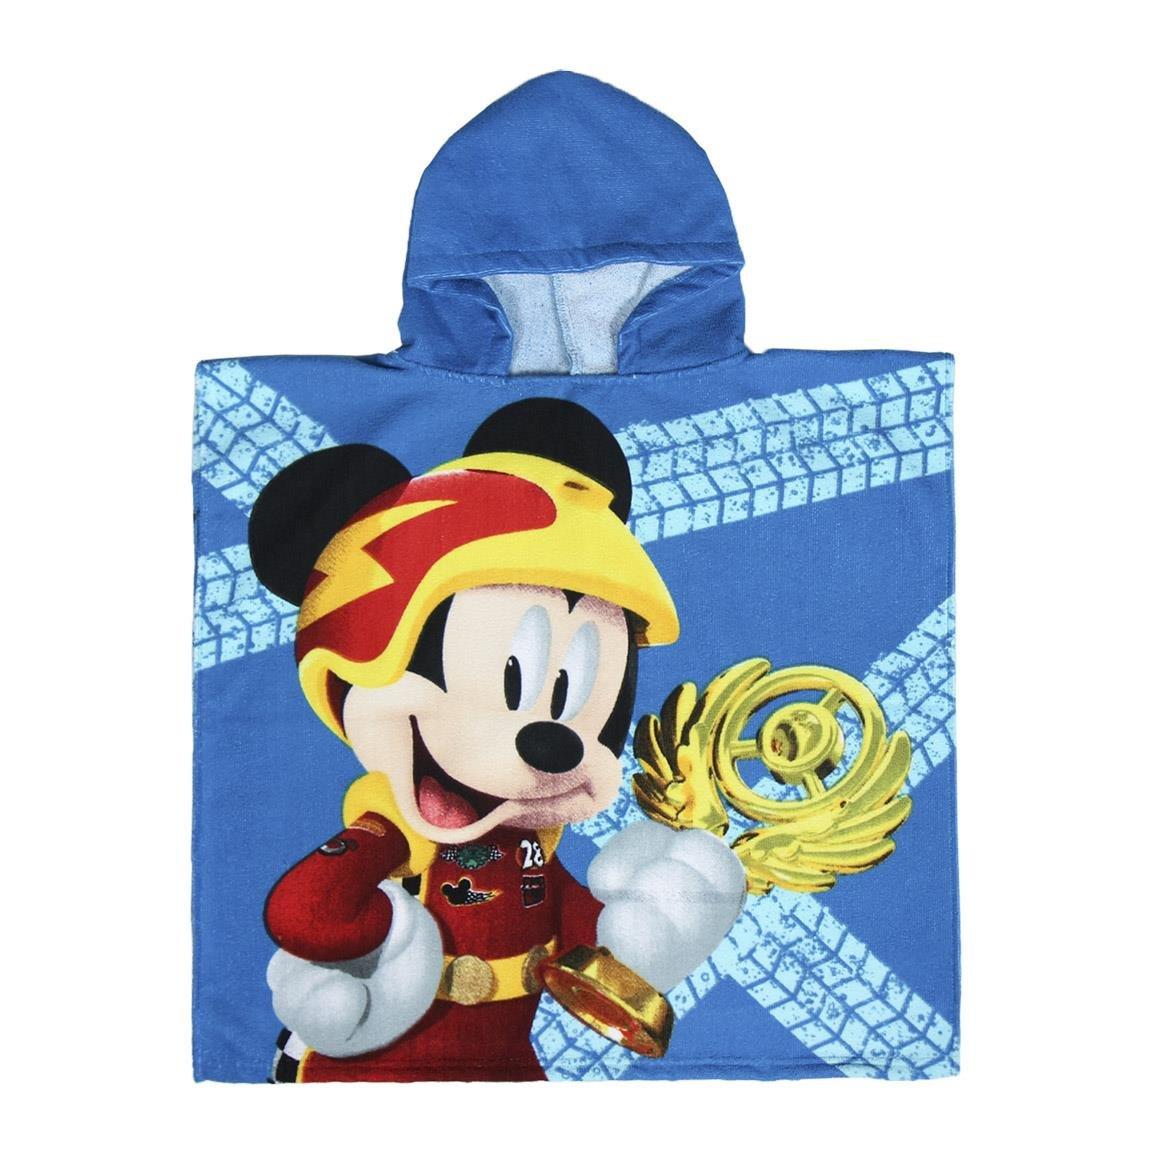 Mickey 2200002808 - Toalla playa y piscina Artesania Cerda